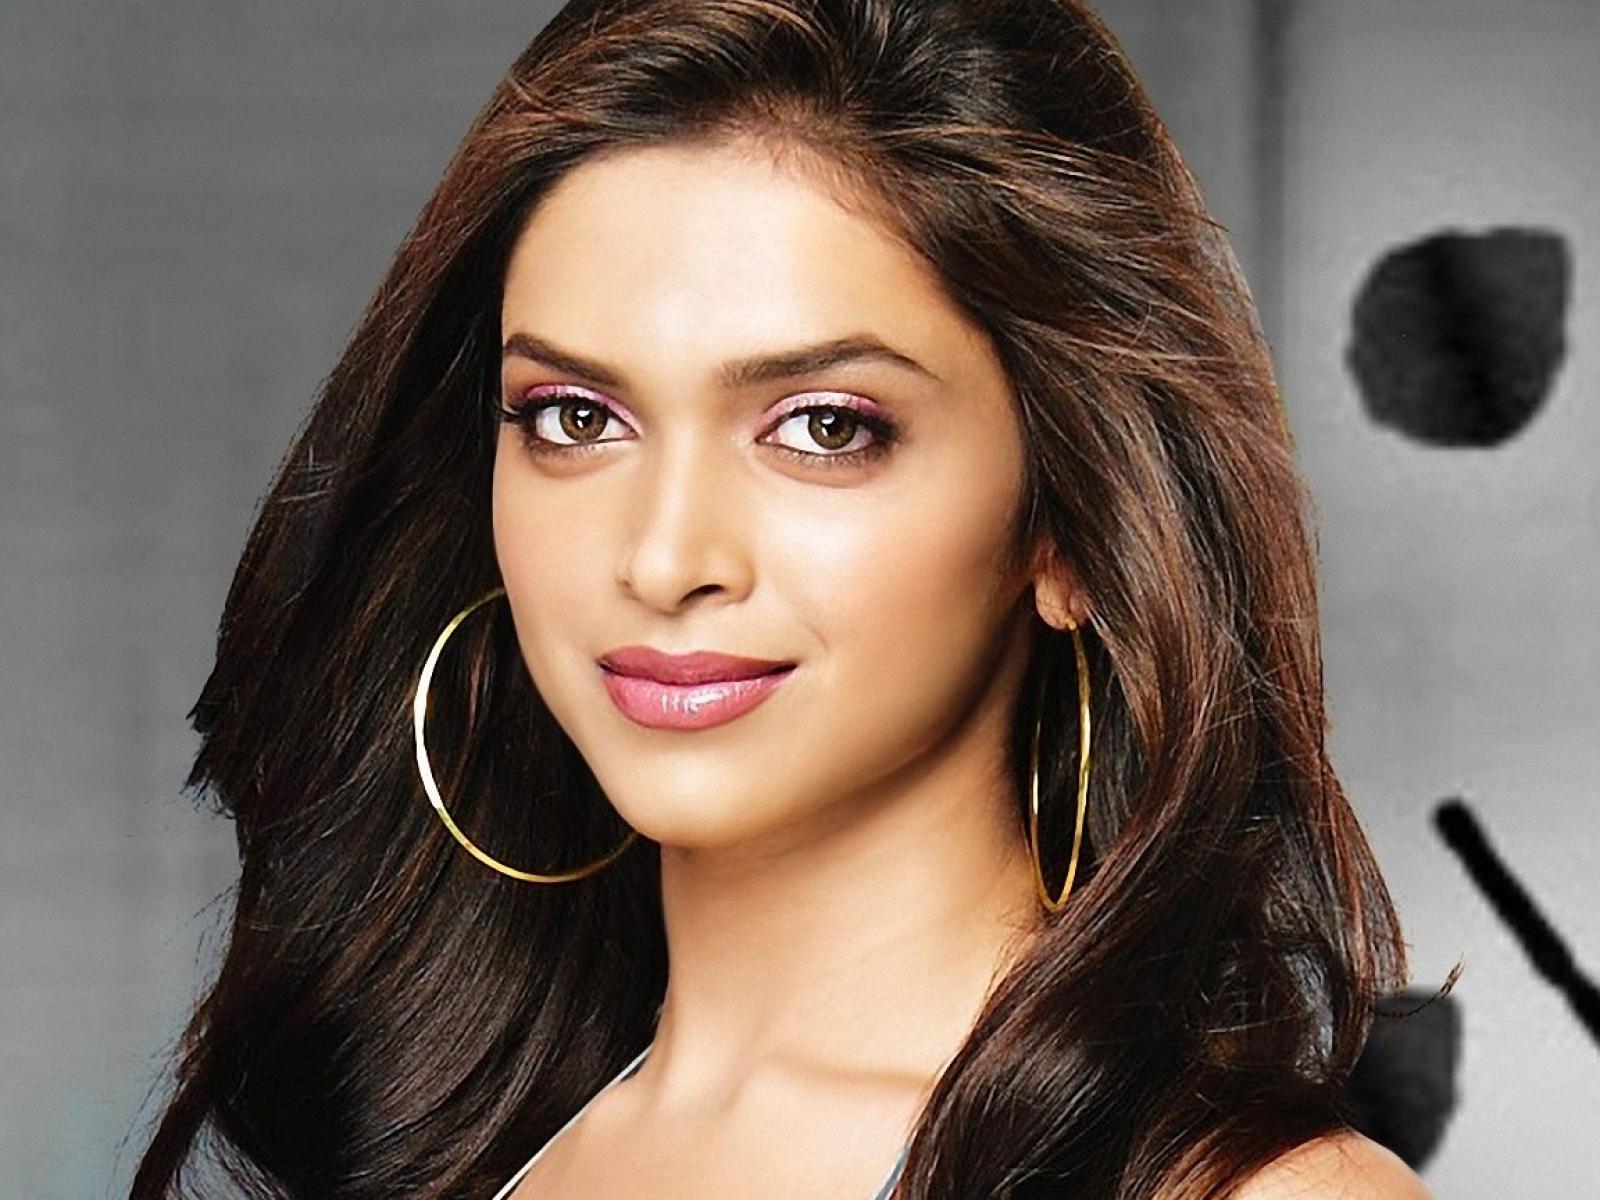 Deepika Padukone Latest HD Wallpapers 2012, Deepika ...